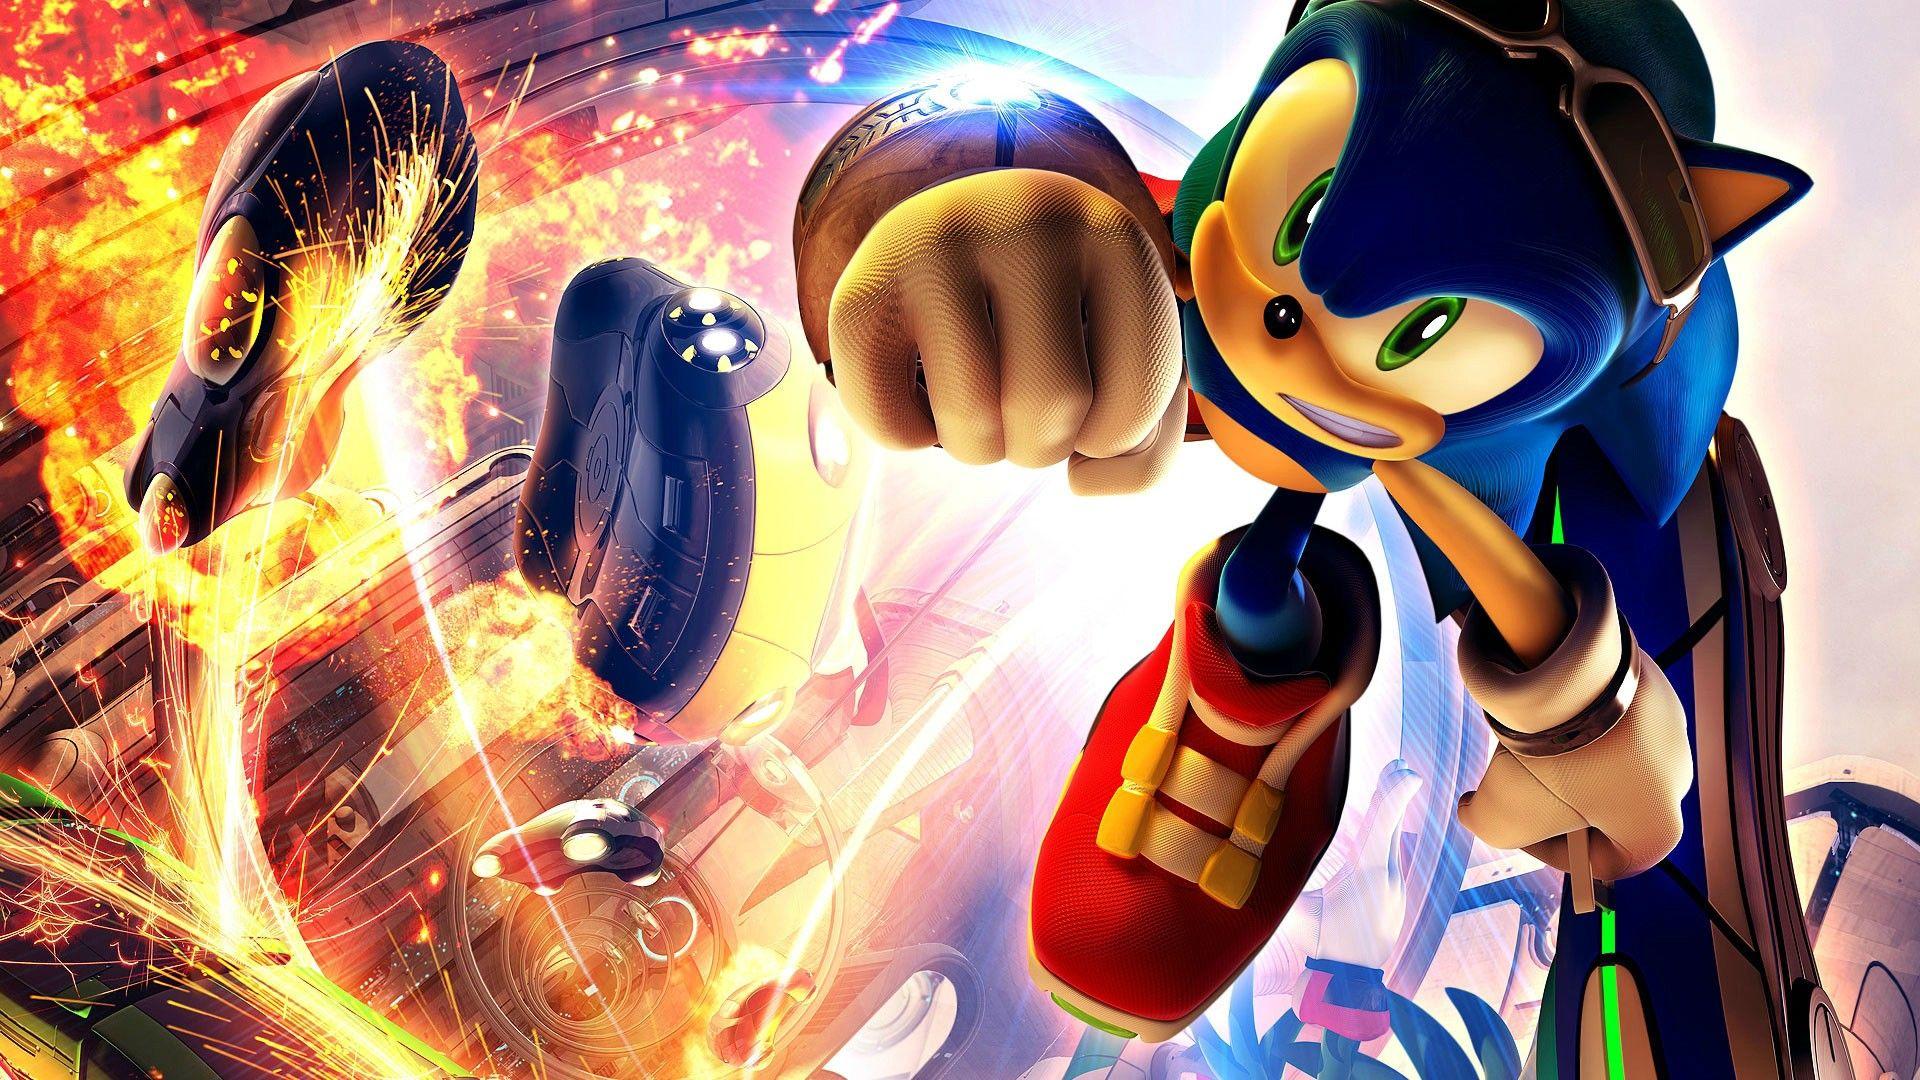 Imgur Sonic The Hedgehog Gaming Wallpapers Cartoon Wallpaper